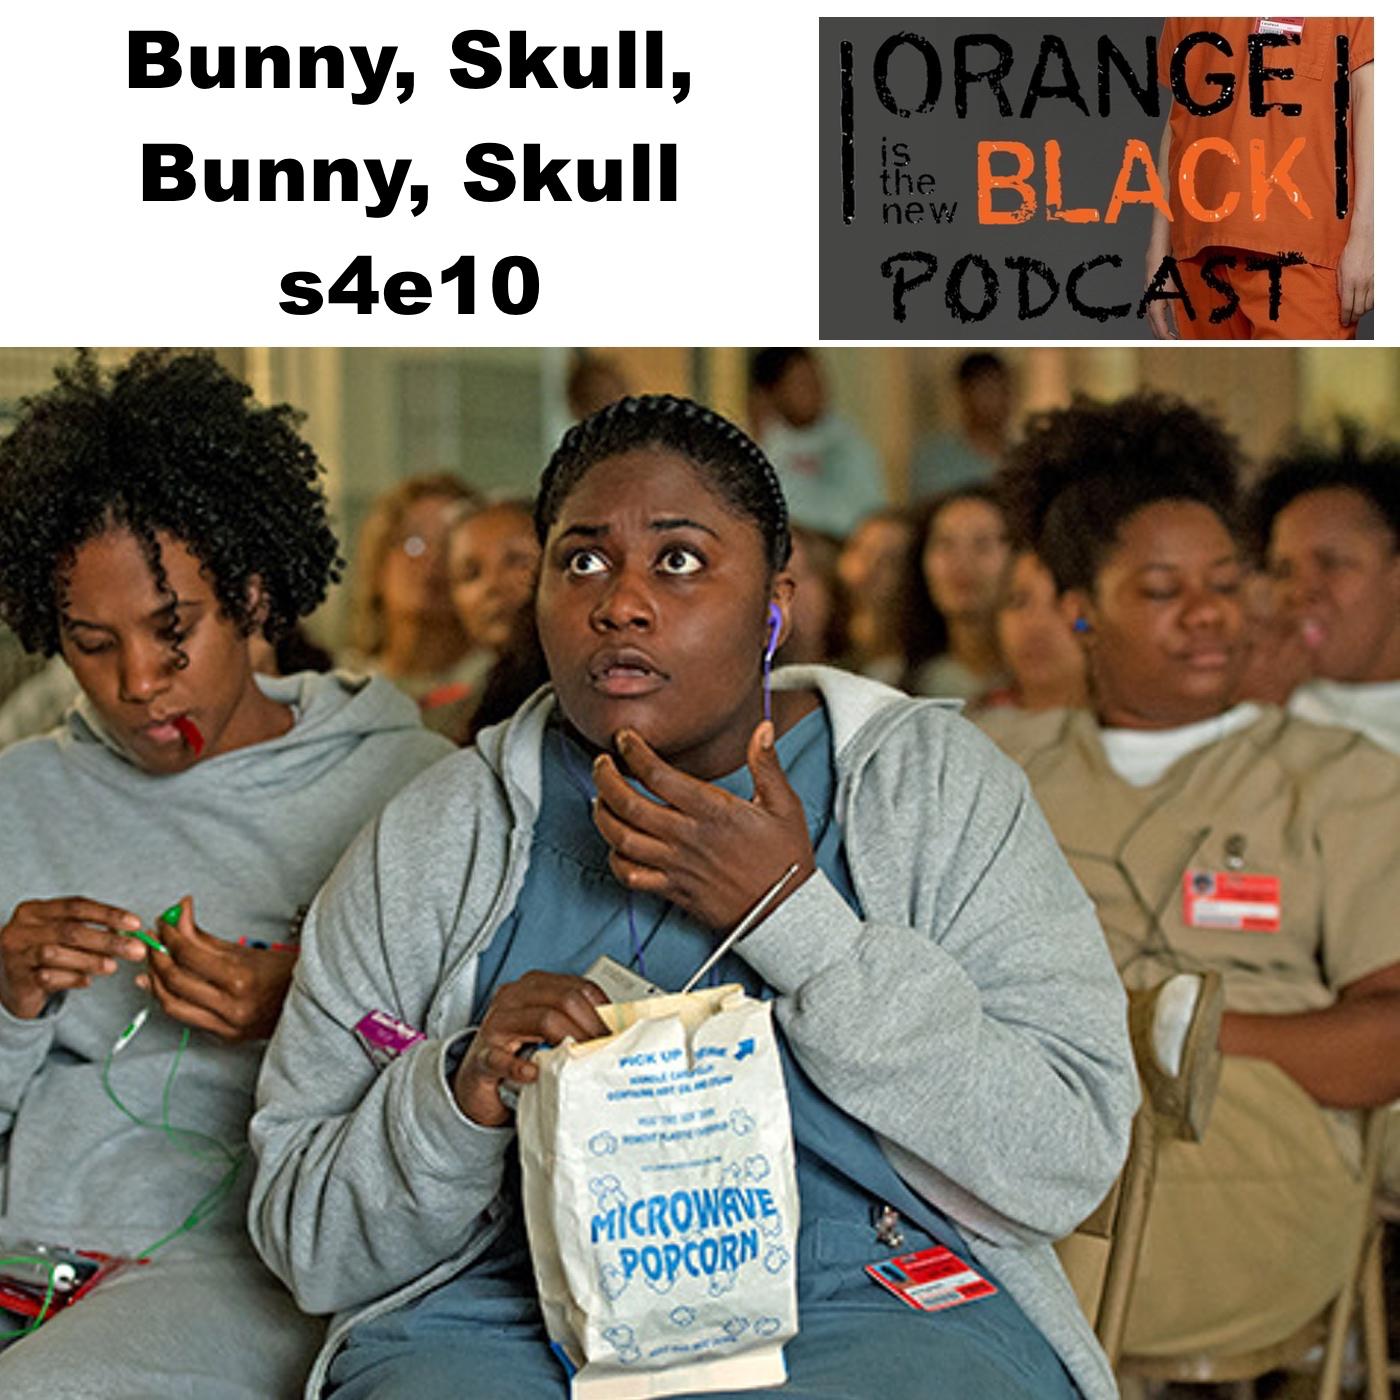 Bunny, Skull, Bunny, Skull s4e10 - Orange is the New Black Podcast